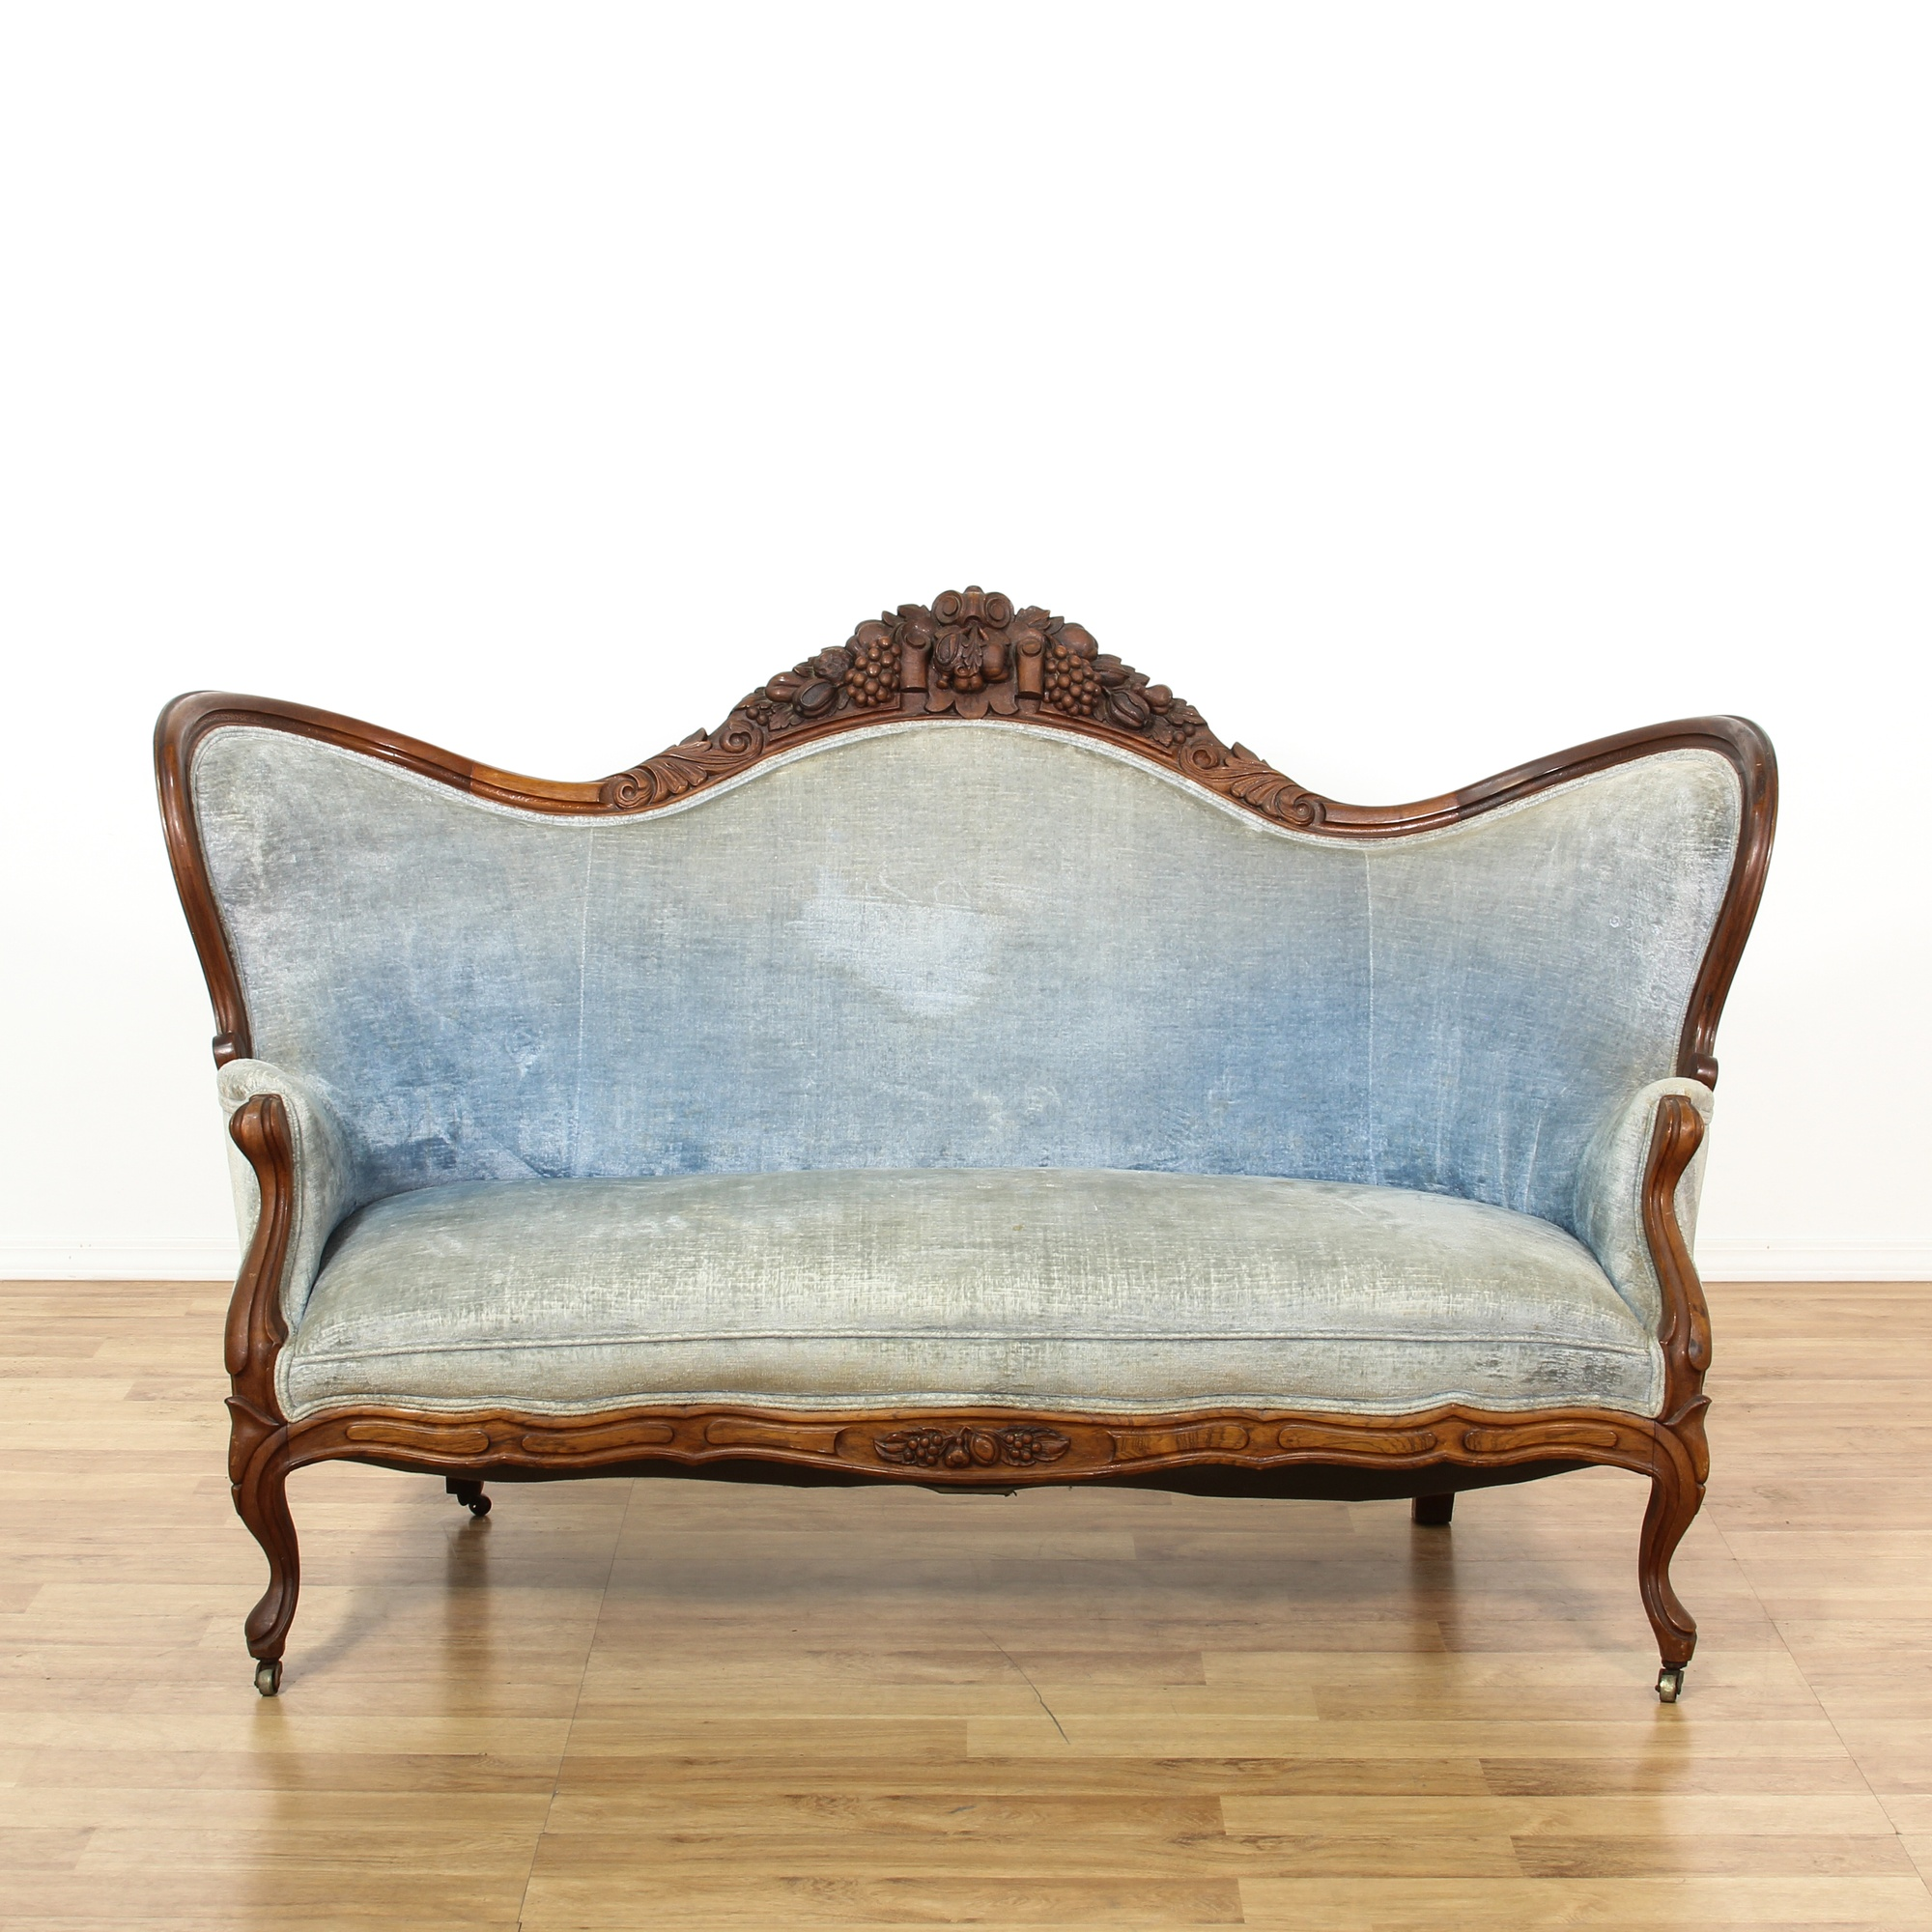 Belter Victorian Style Mahogany Blue Velvet Settee Loveseat Vintage Furniture San Diego Los